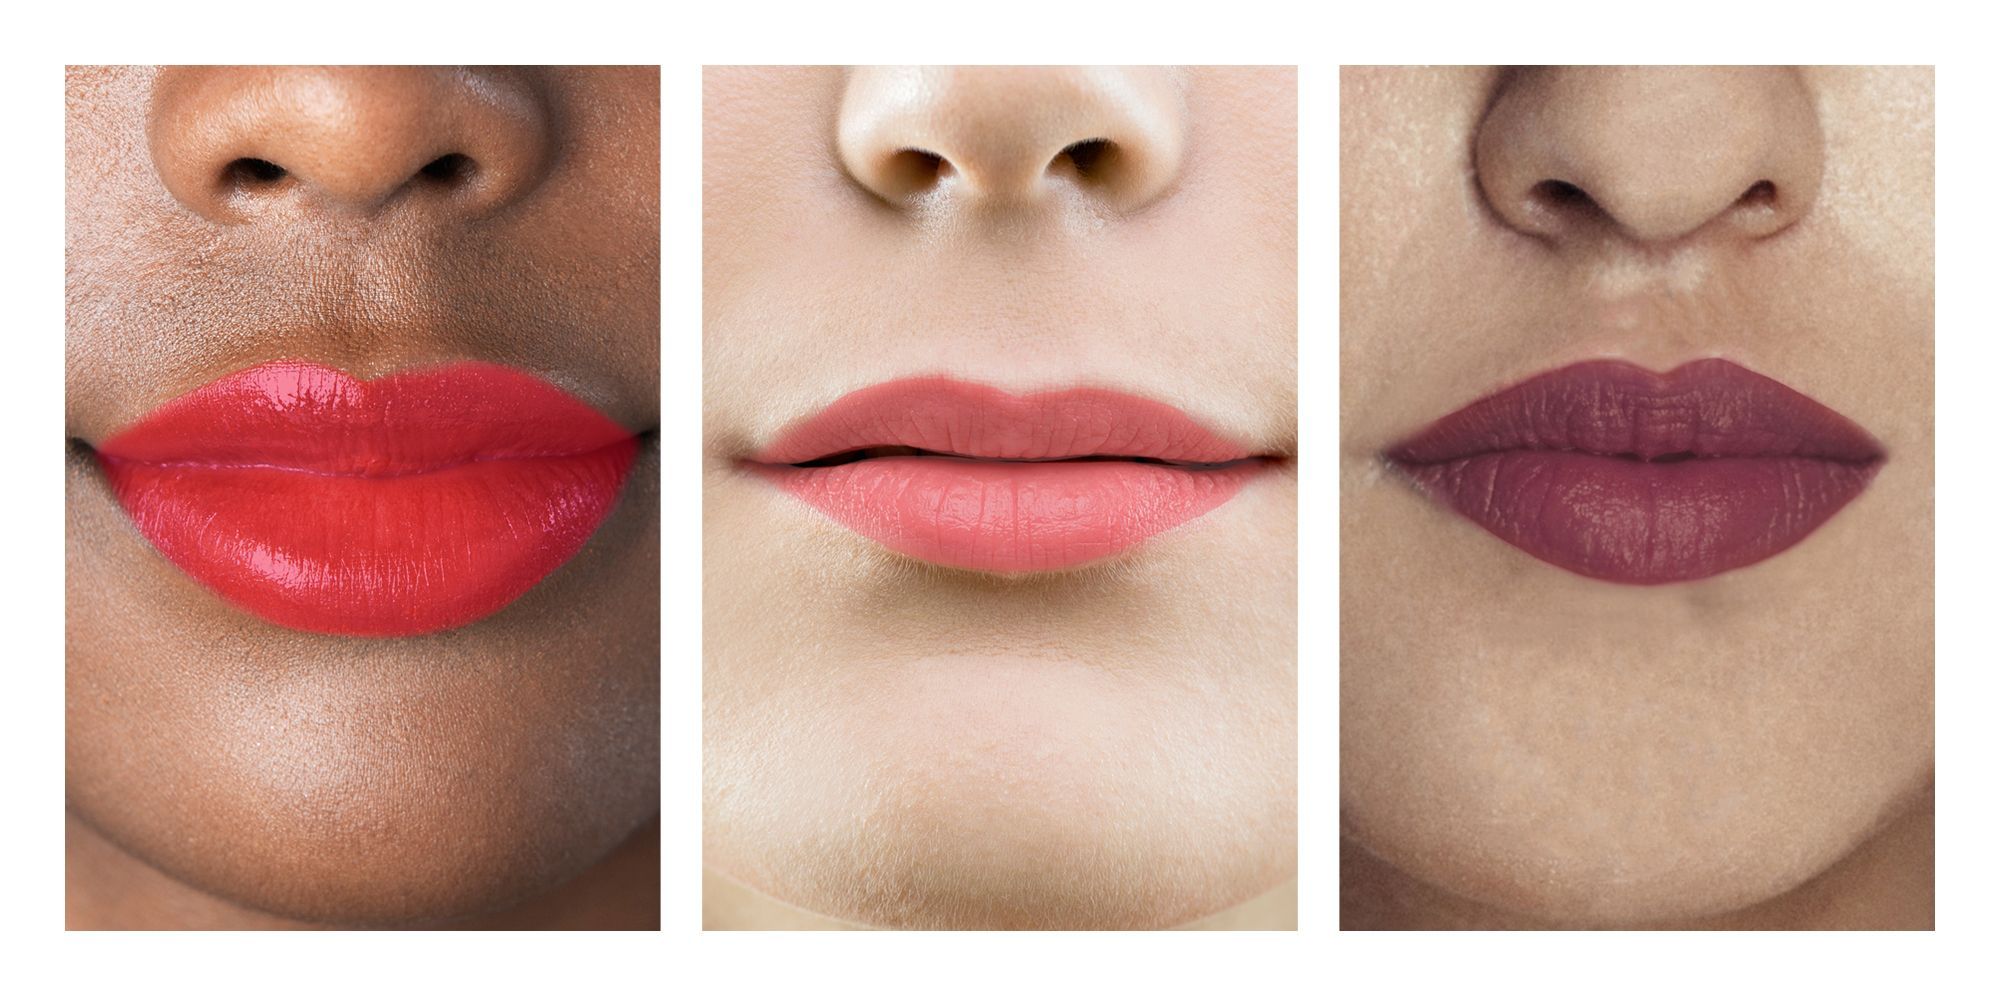 15 Best Matte Lipstick Colors Top Lip Gloss Pencil And Liquid Make Over Makeover Intense Cream Lipstik